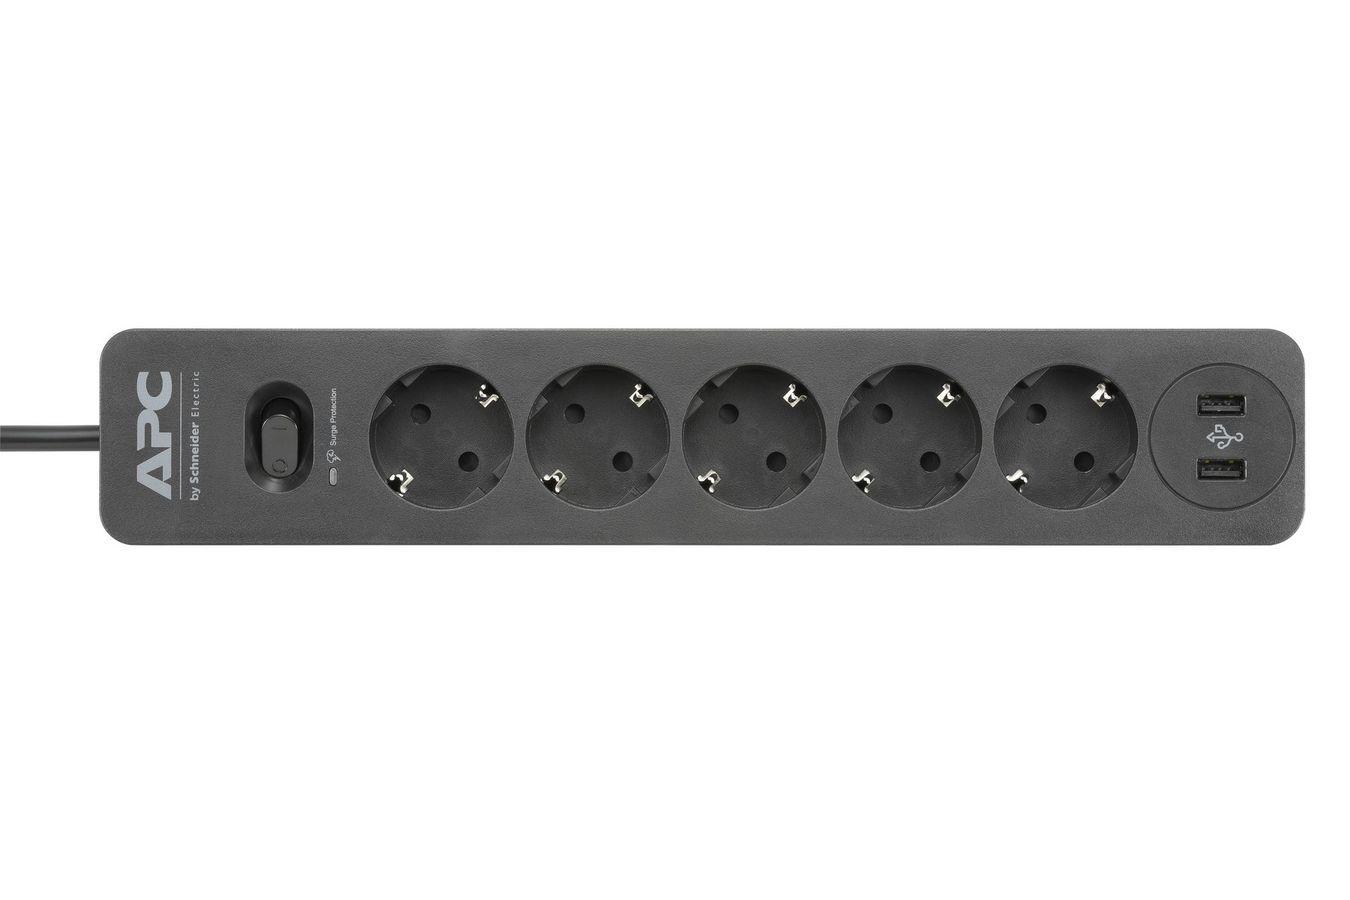 APC ESSENTIAL SURGEARREST 5 OUTLET 2 USB PORTS BLACK 230V GERMANY elektrības pagarinātājs